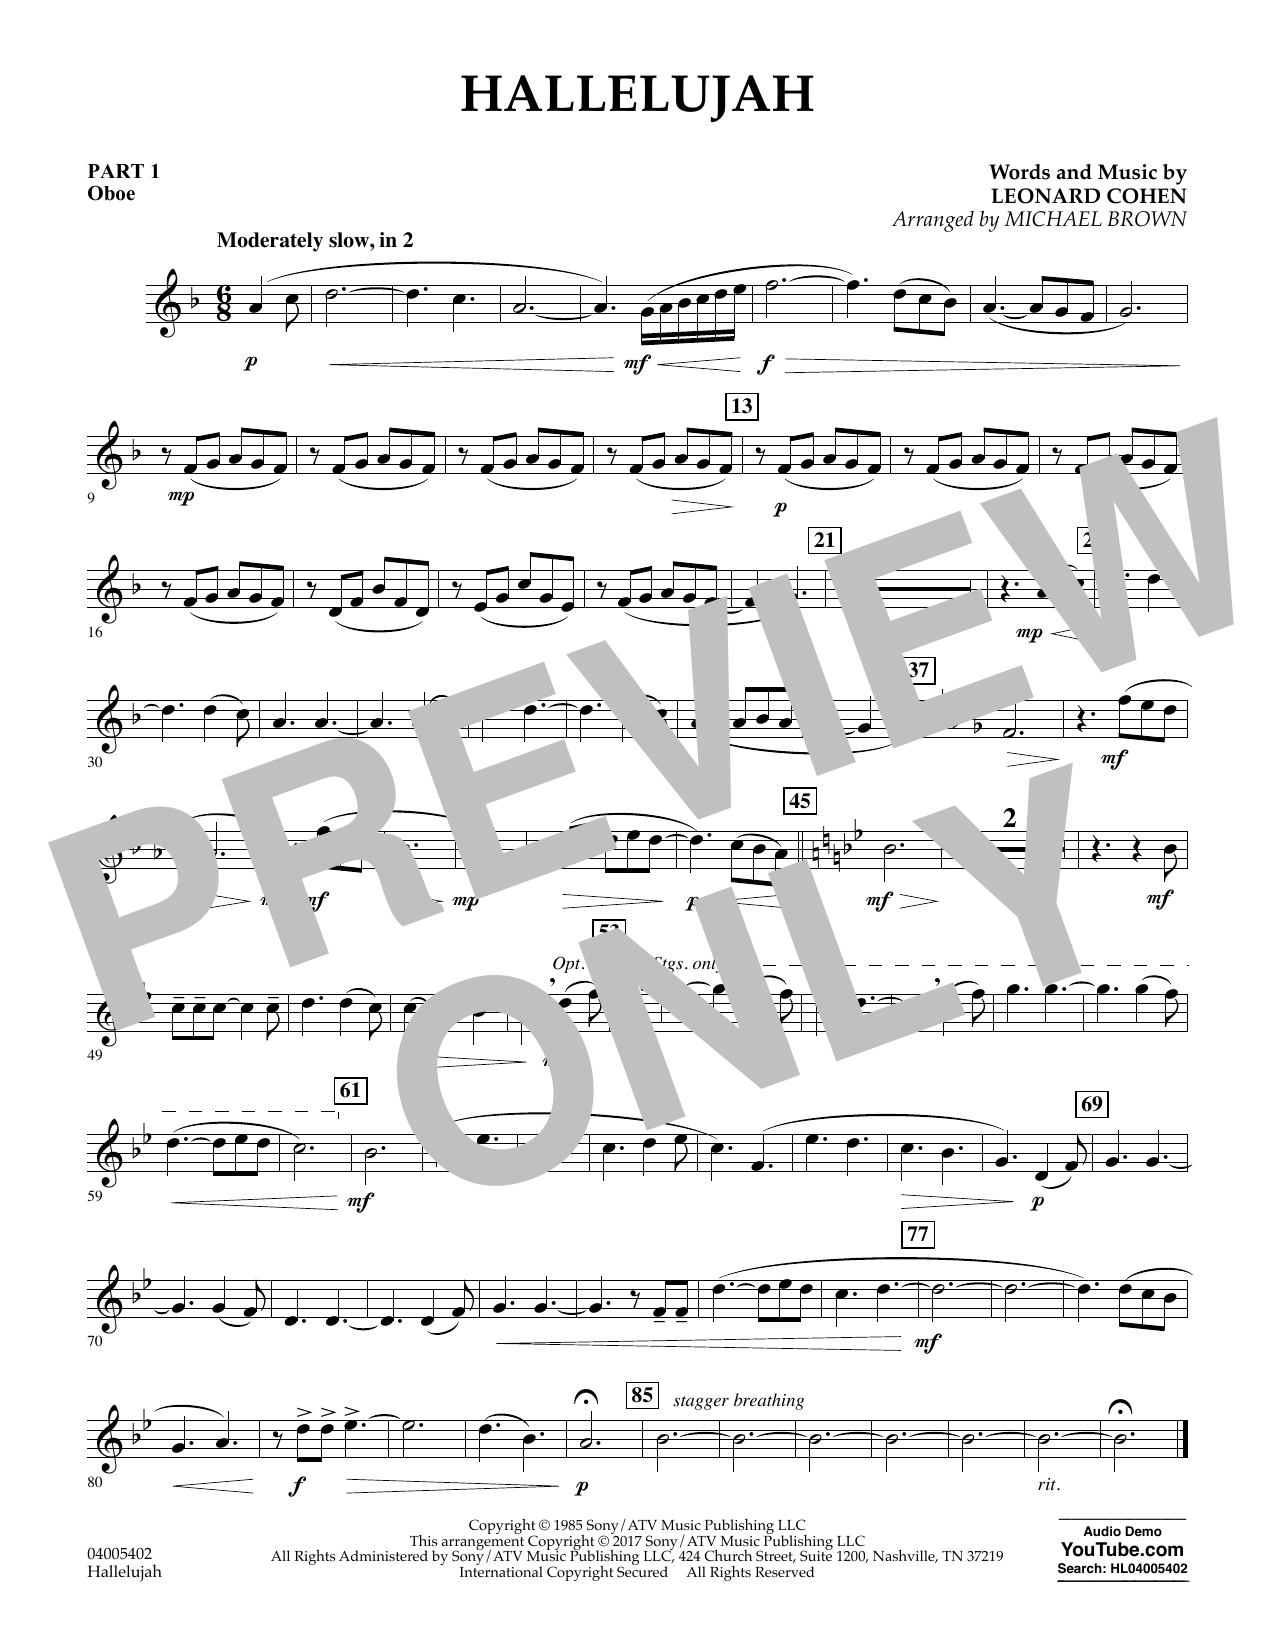 Hallelujah - Pt.1 - Oboe Sheet Music